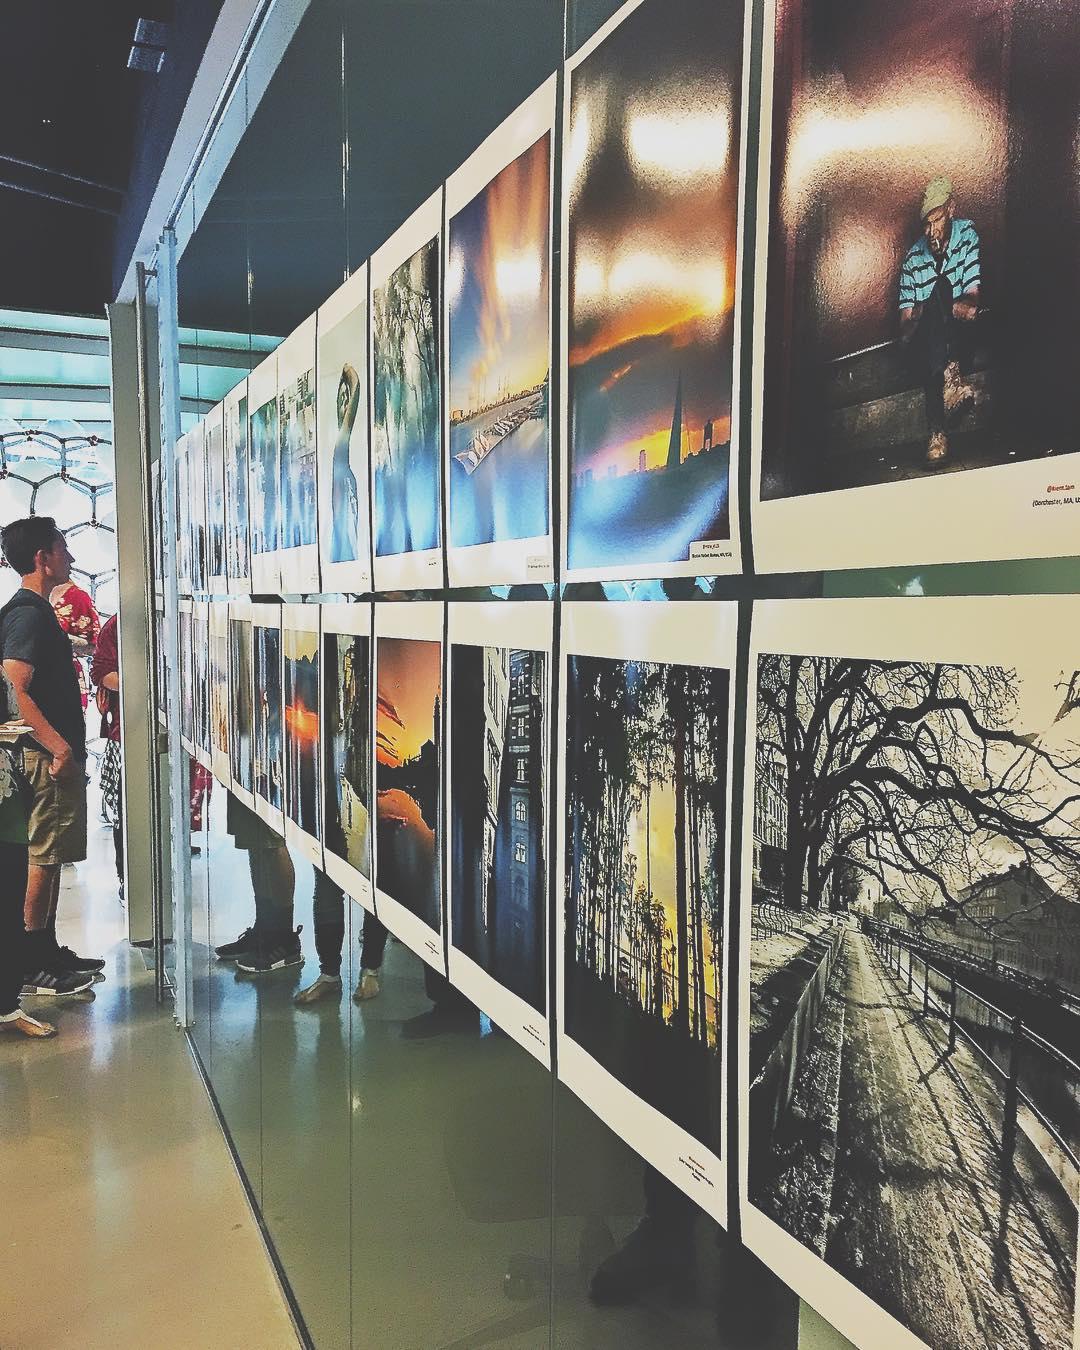 @kk021 #igboston_galleryspace17